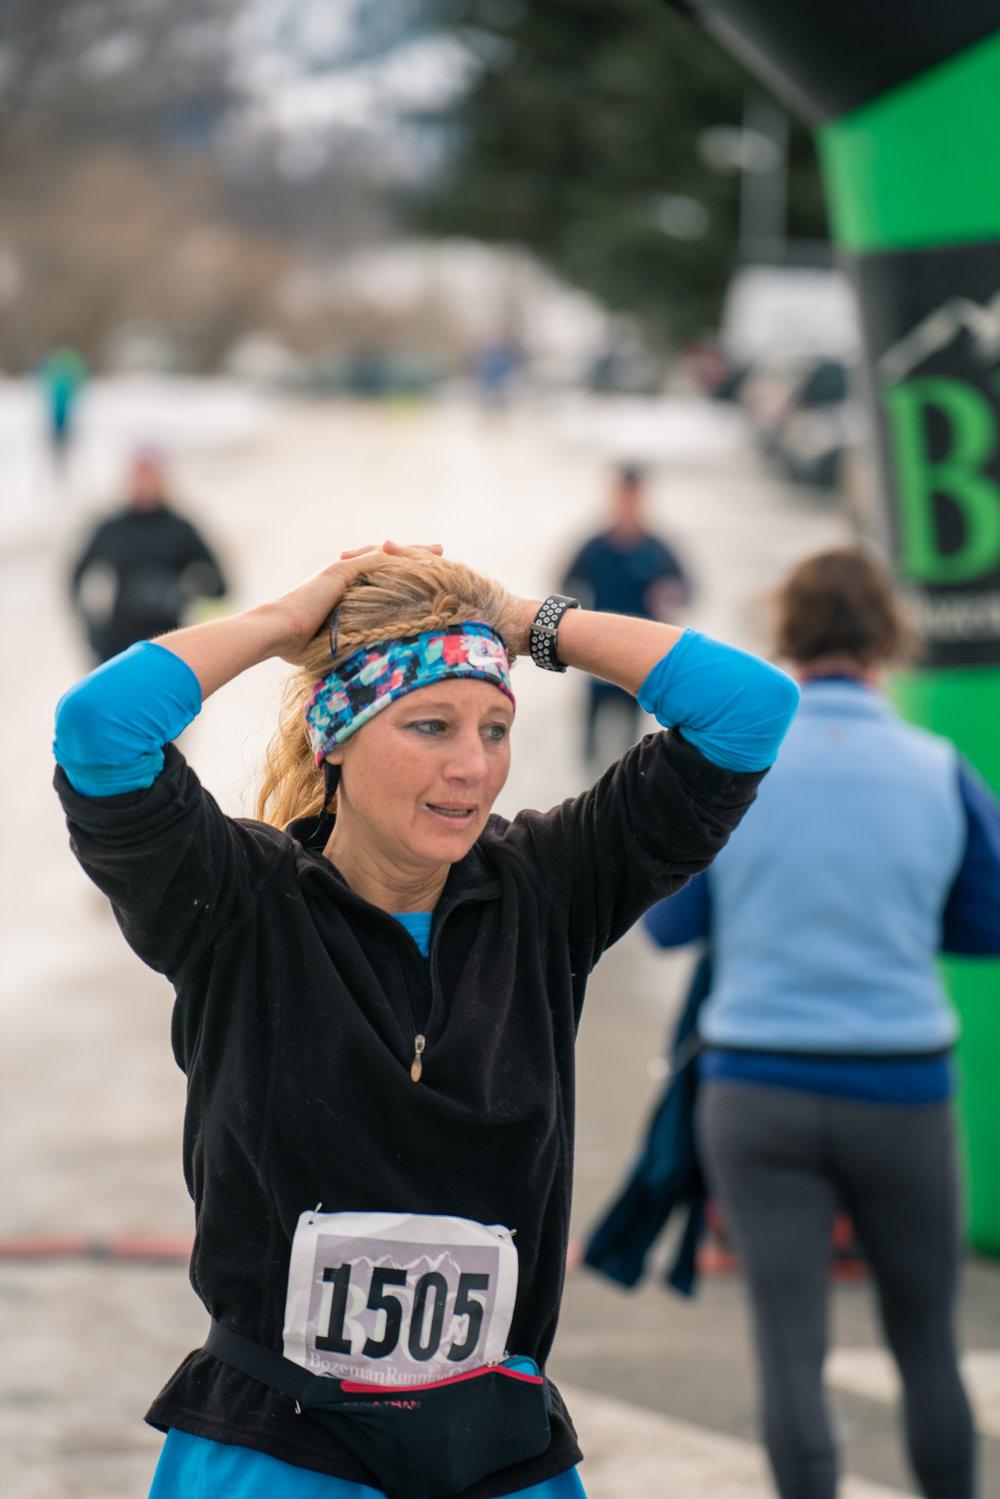 Crossing the finish line during Bozeman Running Co.'s racing of the Bear near Bozeman, Montana.